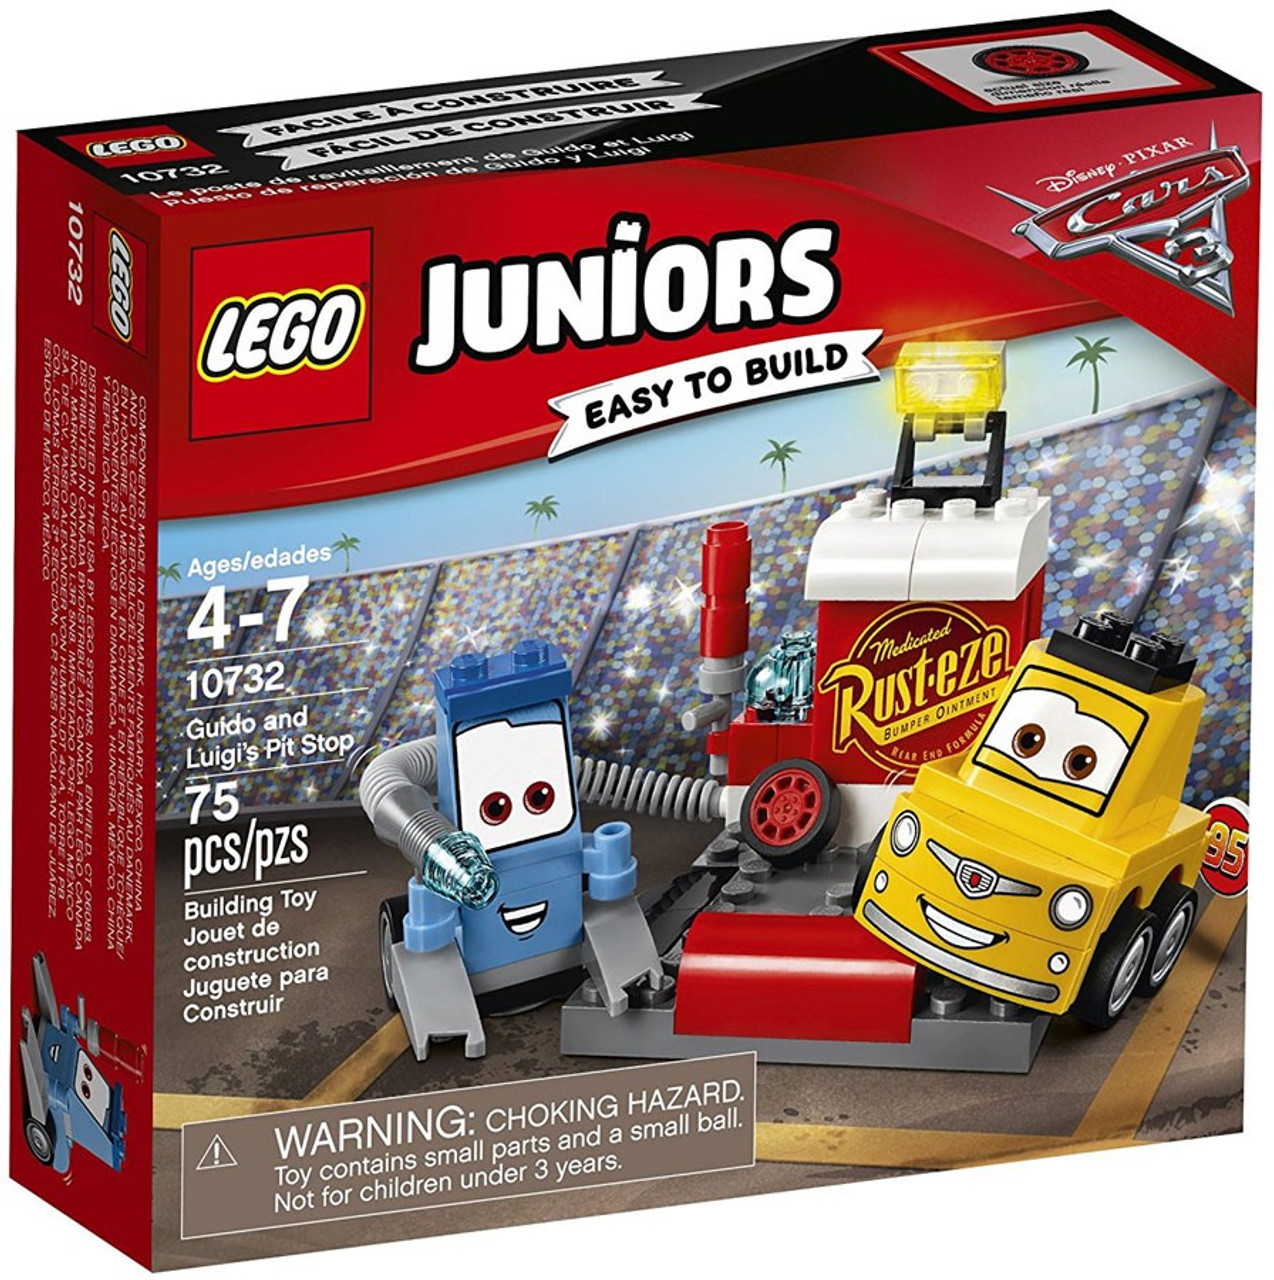 Lego Disney Pixar Cars Cars 3 Juniors Guido And Luigis Pit Stop Set 10732 Toywiz